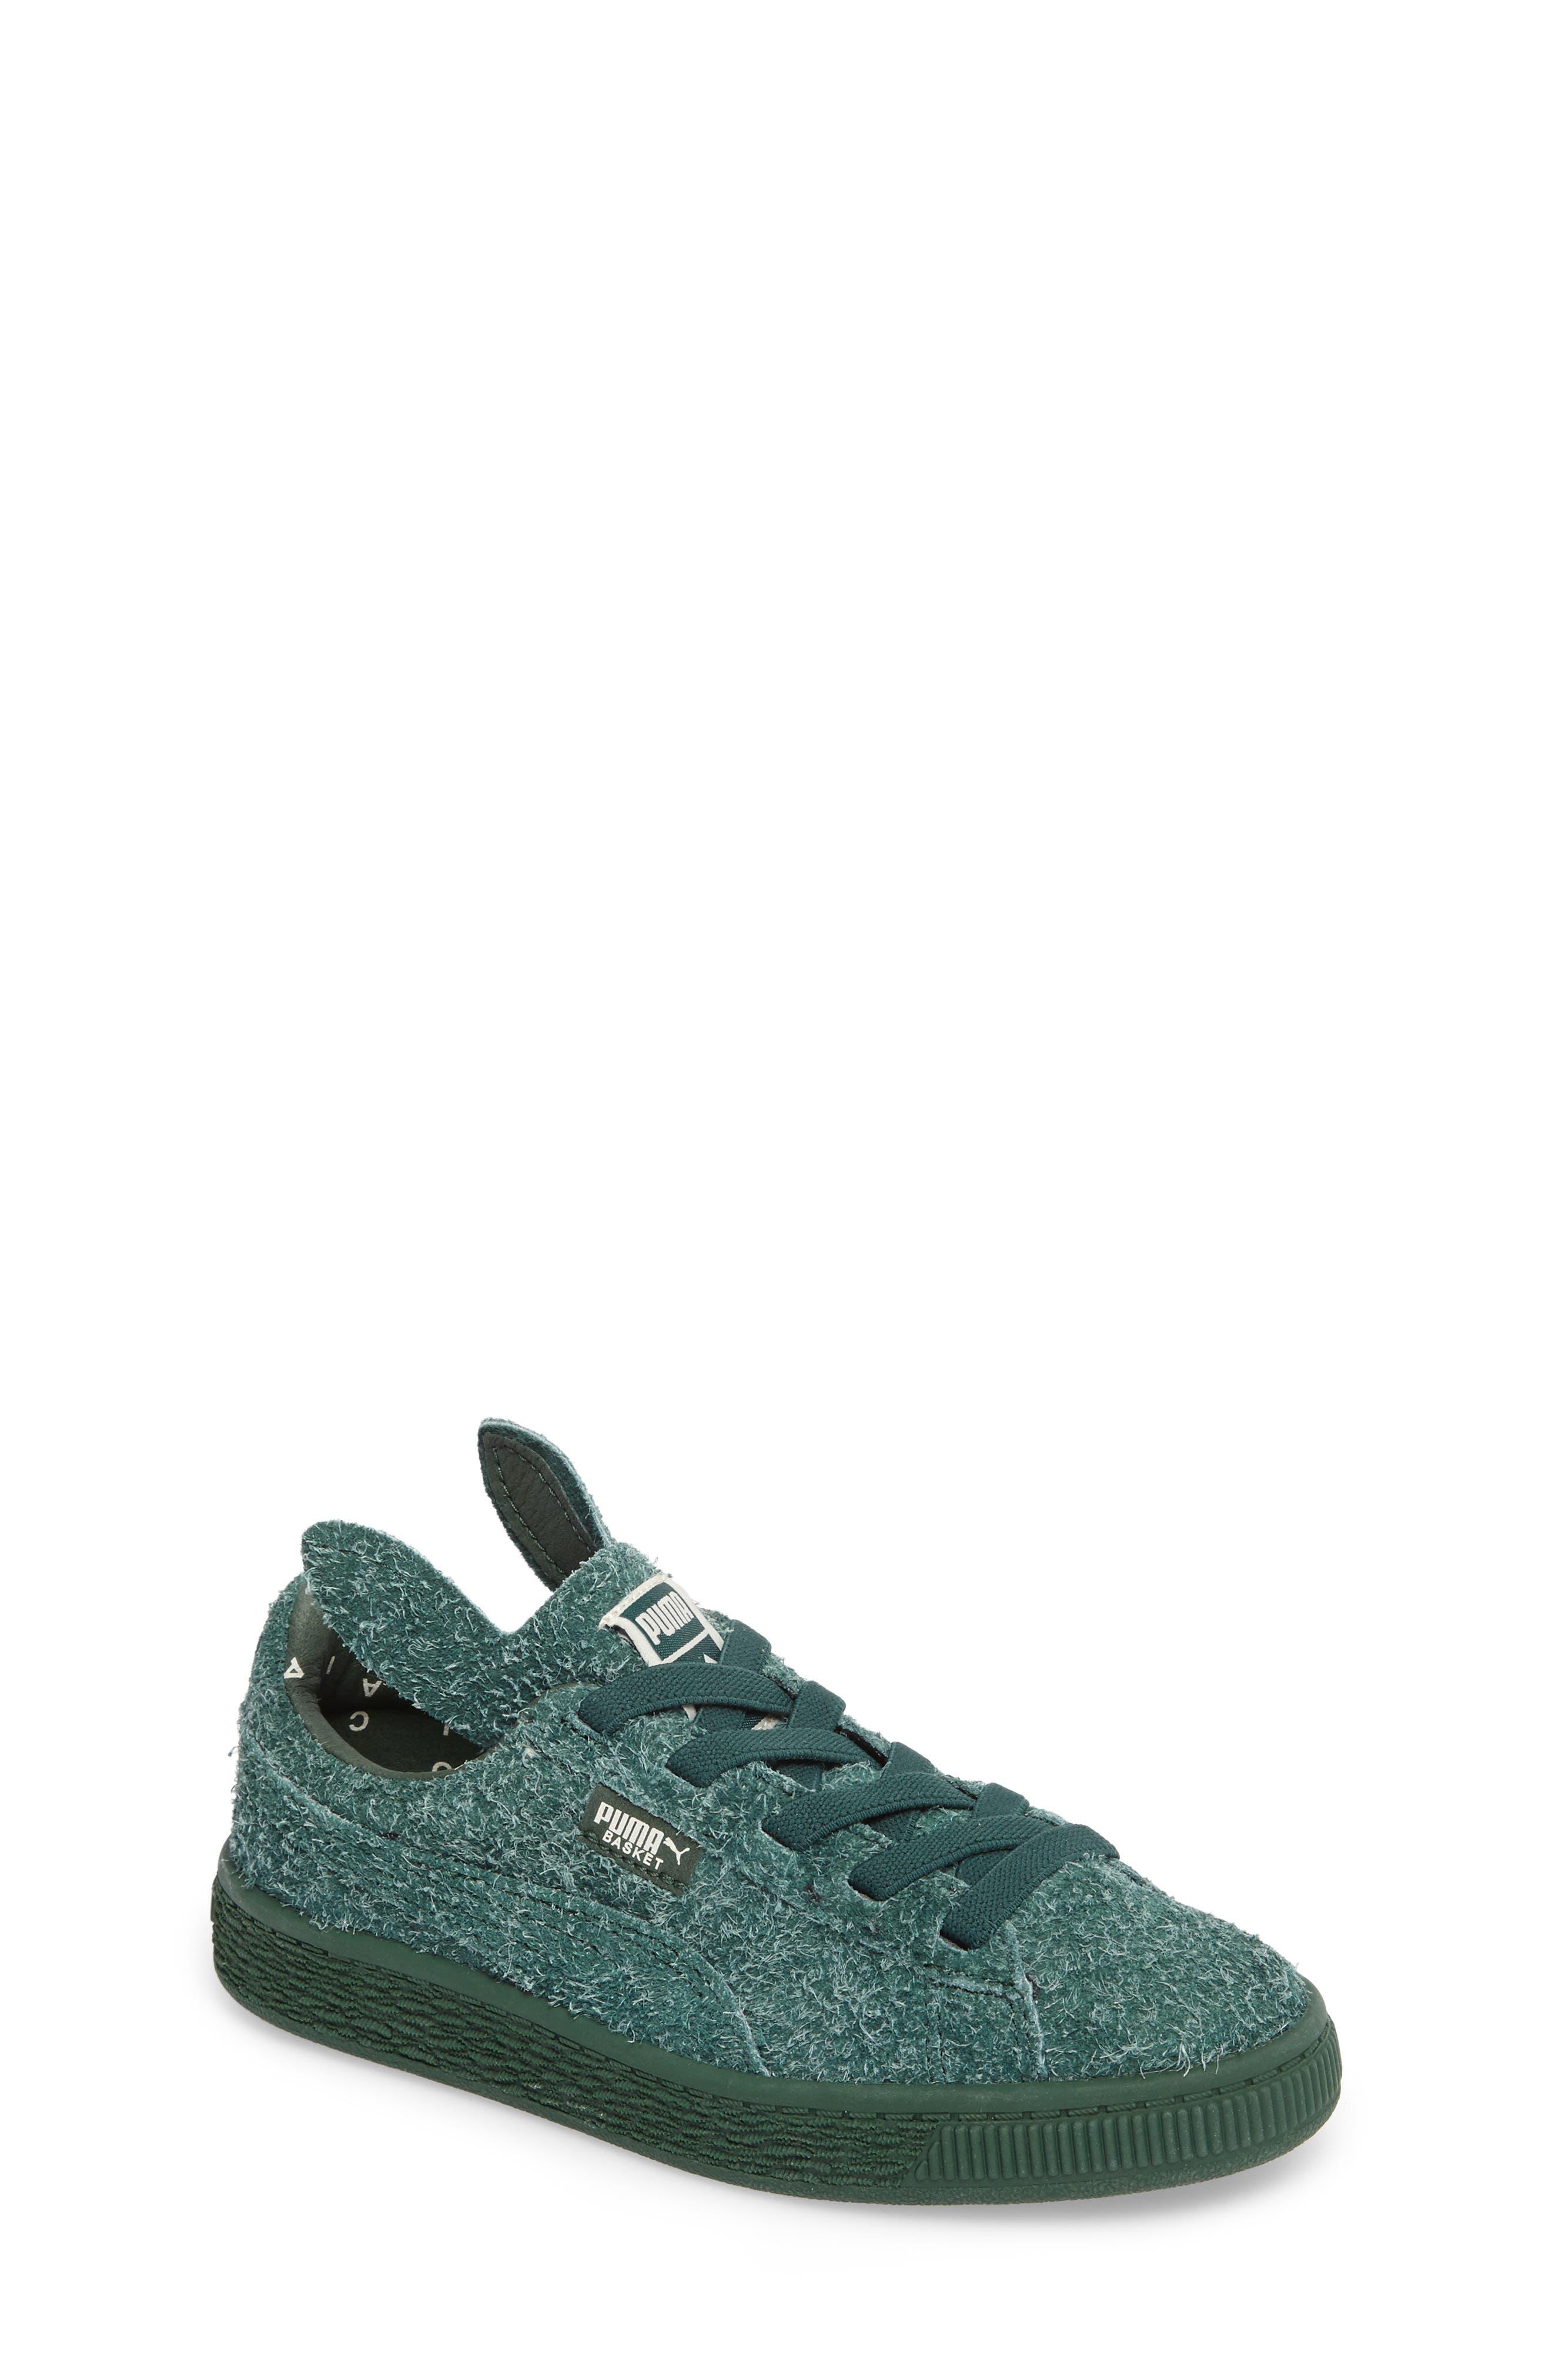 x tinycottons Basket Furry Sneaker,                             Main thumbnail 1, color,                             300